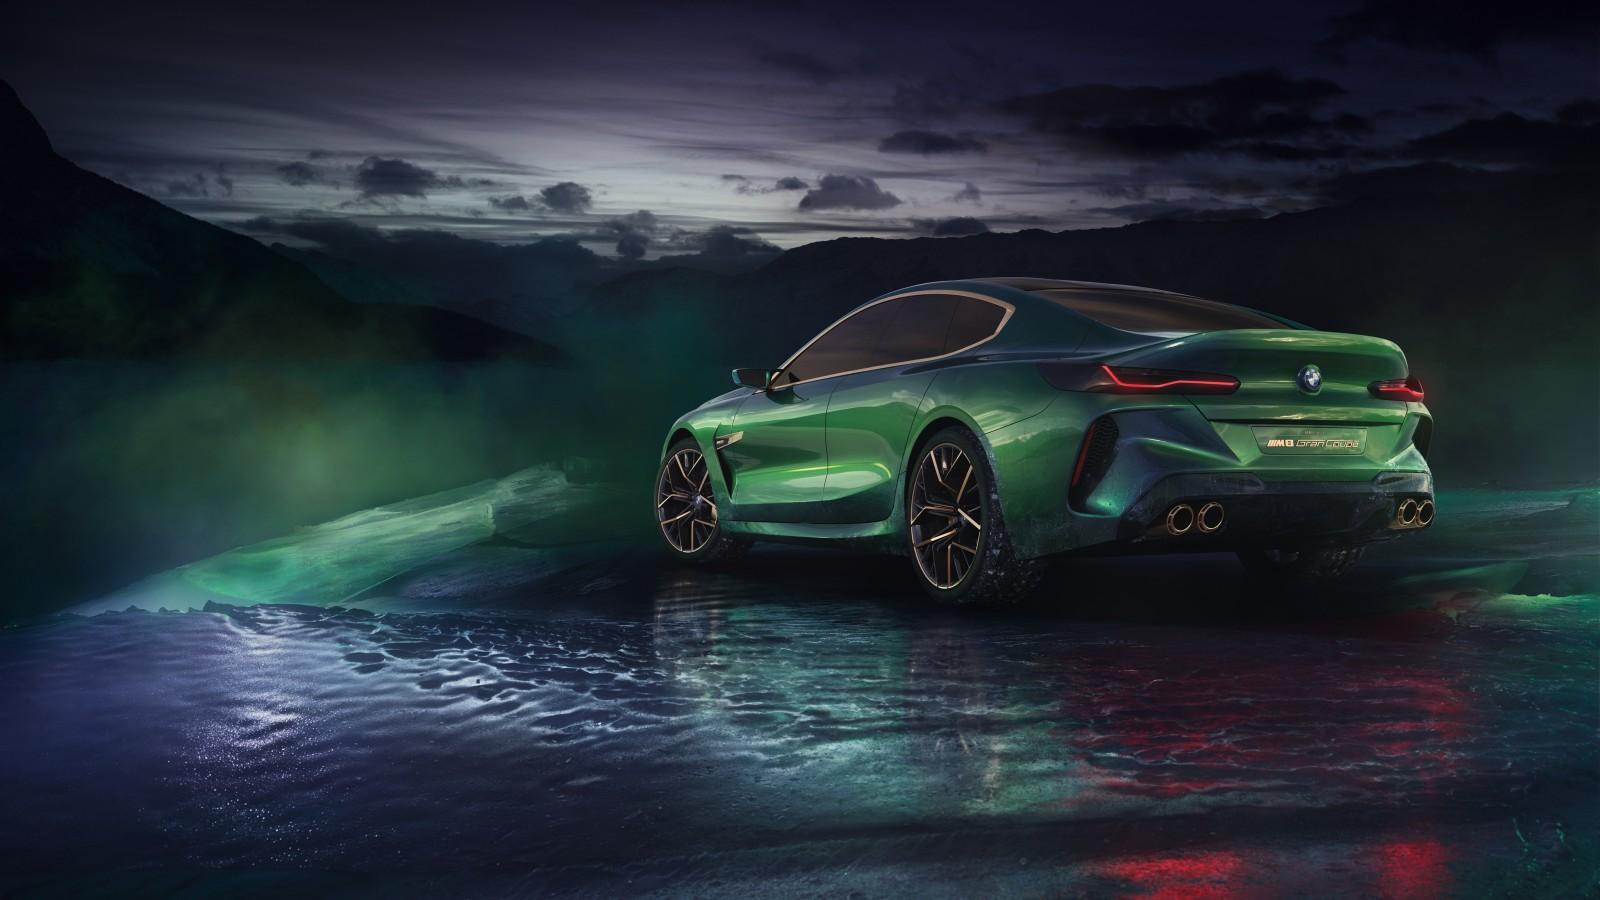 2018 BMW Concept M8 Gran Coupe 4K 4 Wallpaper